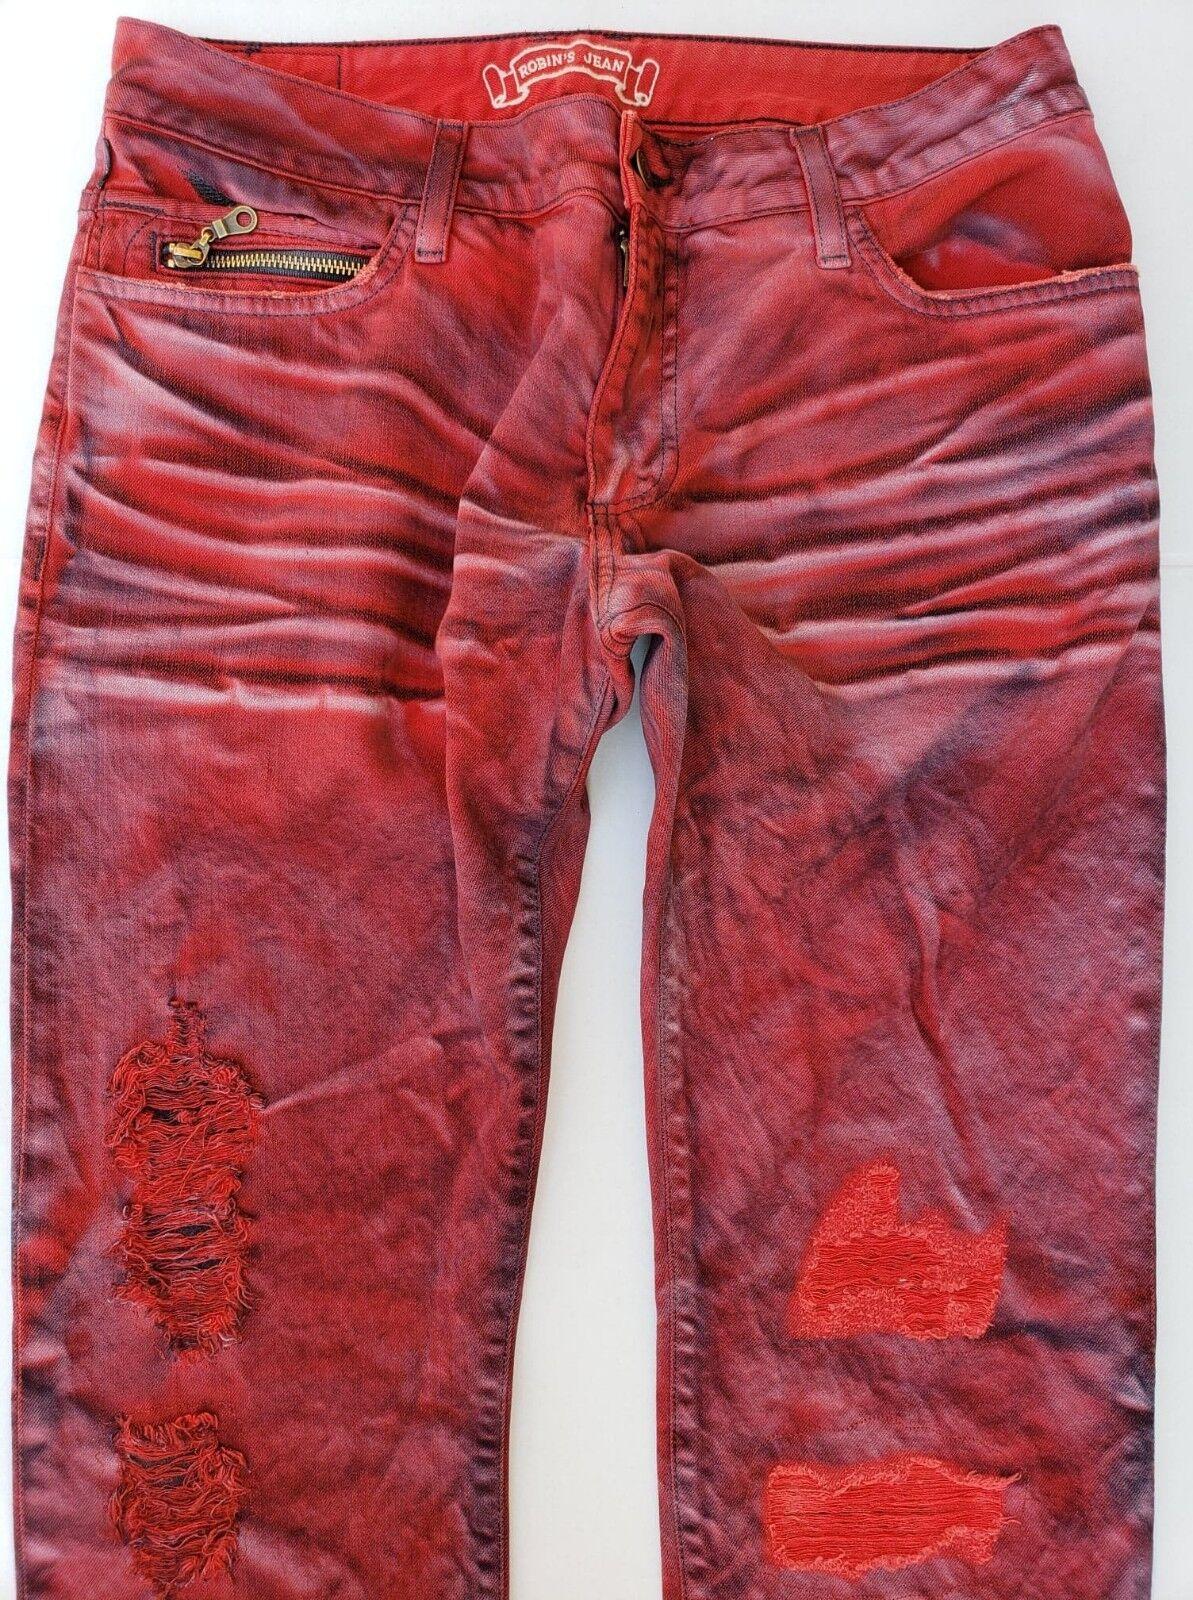 New Men's ROBIN'S JEAN sz 44 Short Flap Slim Straight Distress Jeans -ZIPPERS